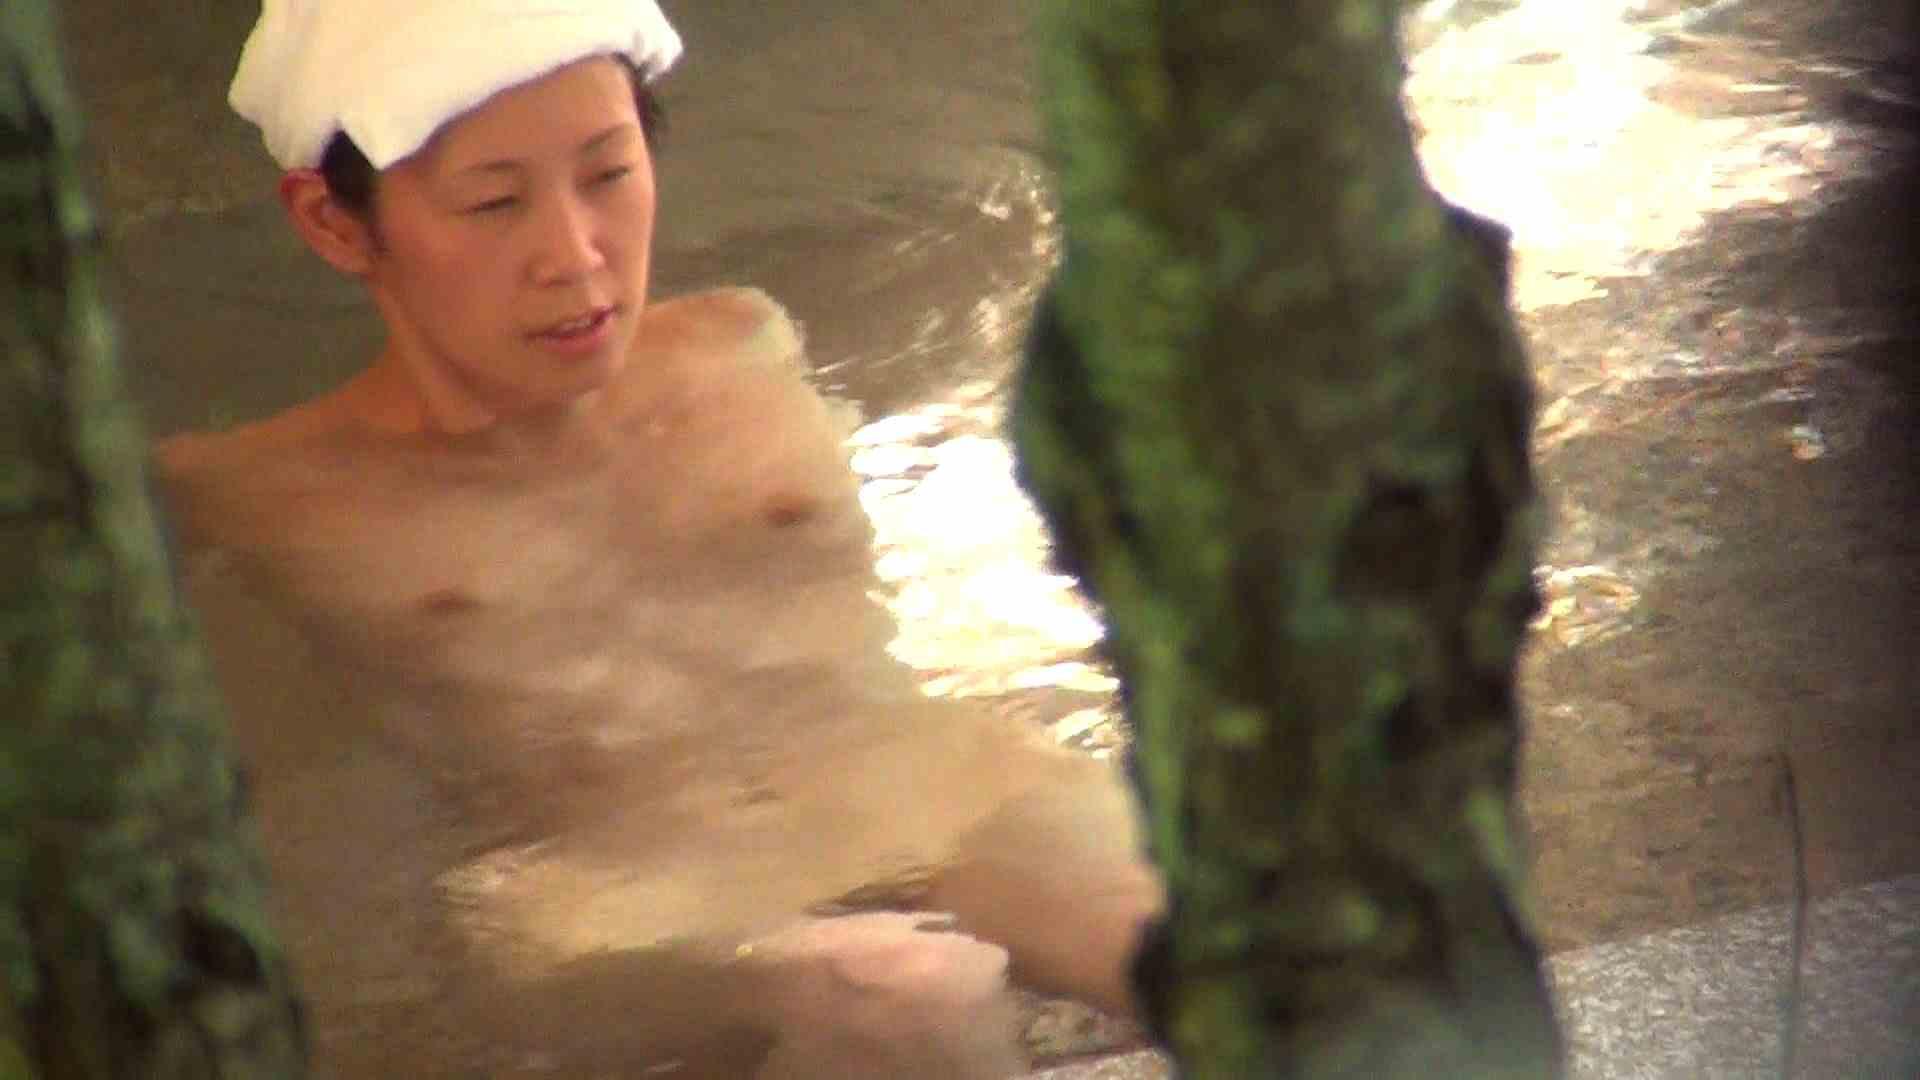 Aquaな露天風呂Vol.281 OLセックス  78画像 75